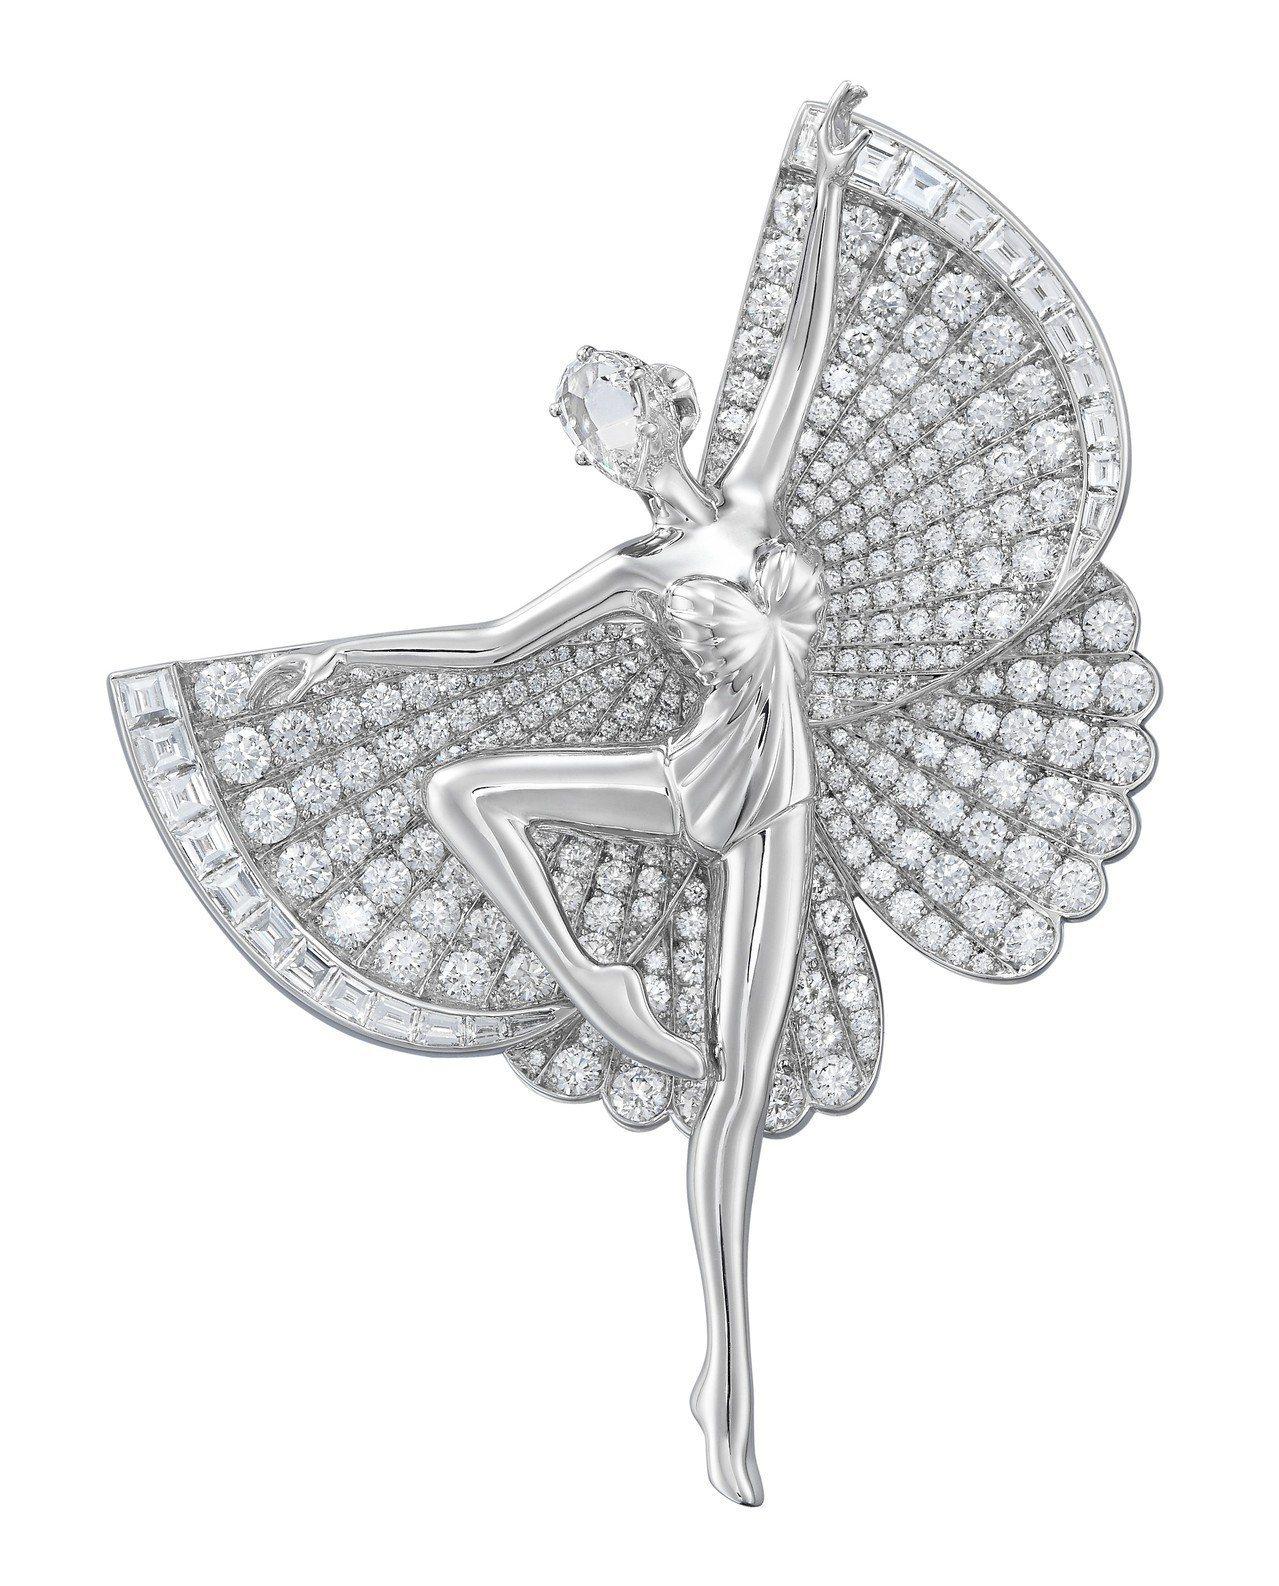 Ballerina 胸針2018年作品,白K金鑲嵌鑽石。圖/梵克雅寶提供